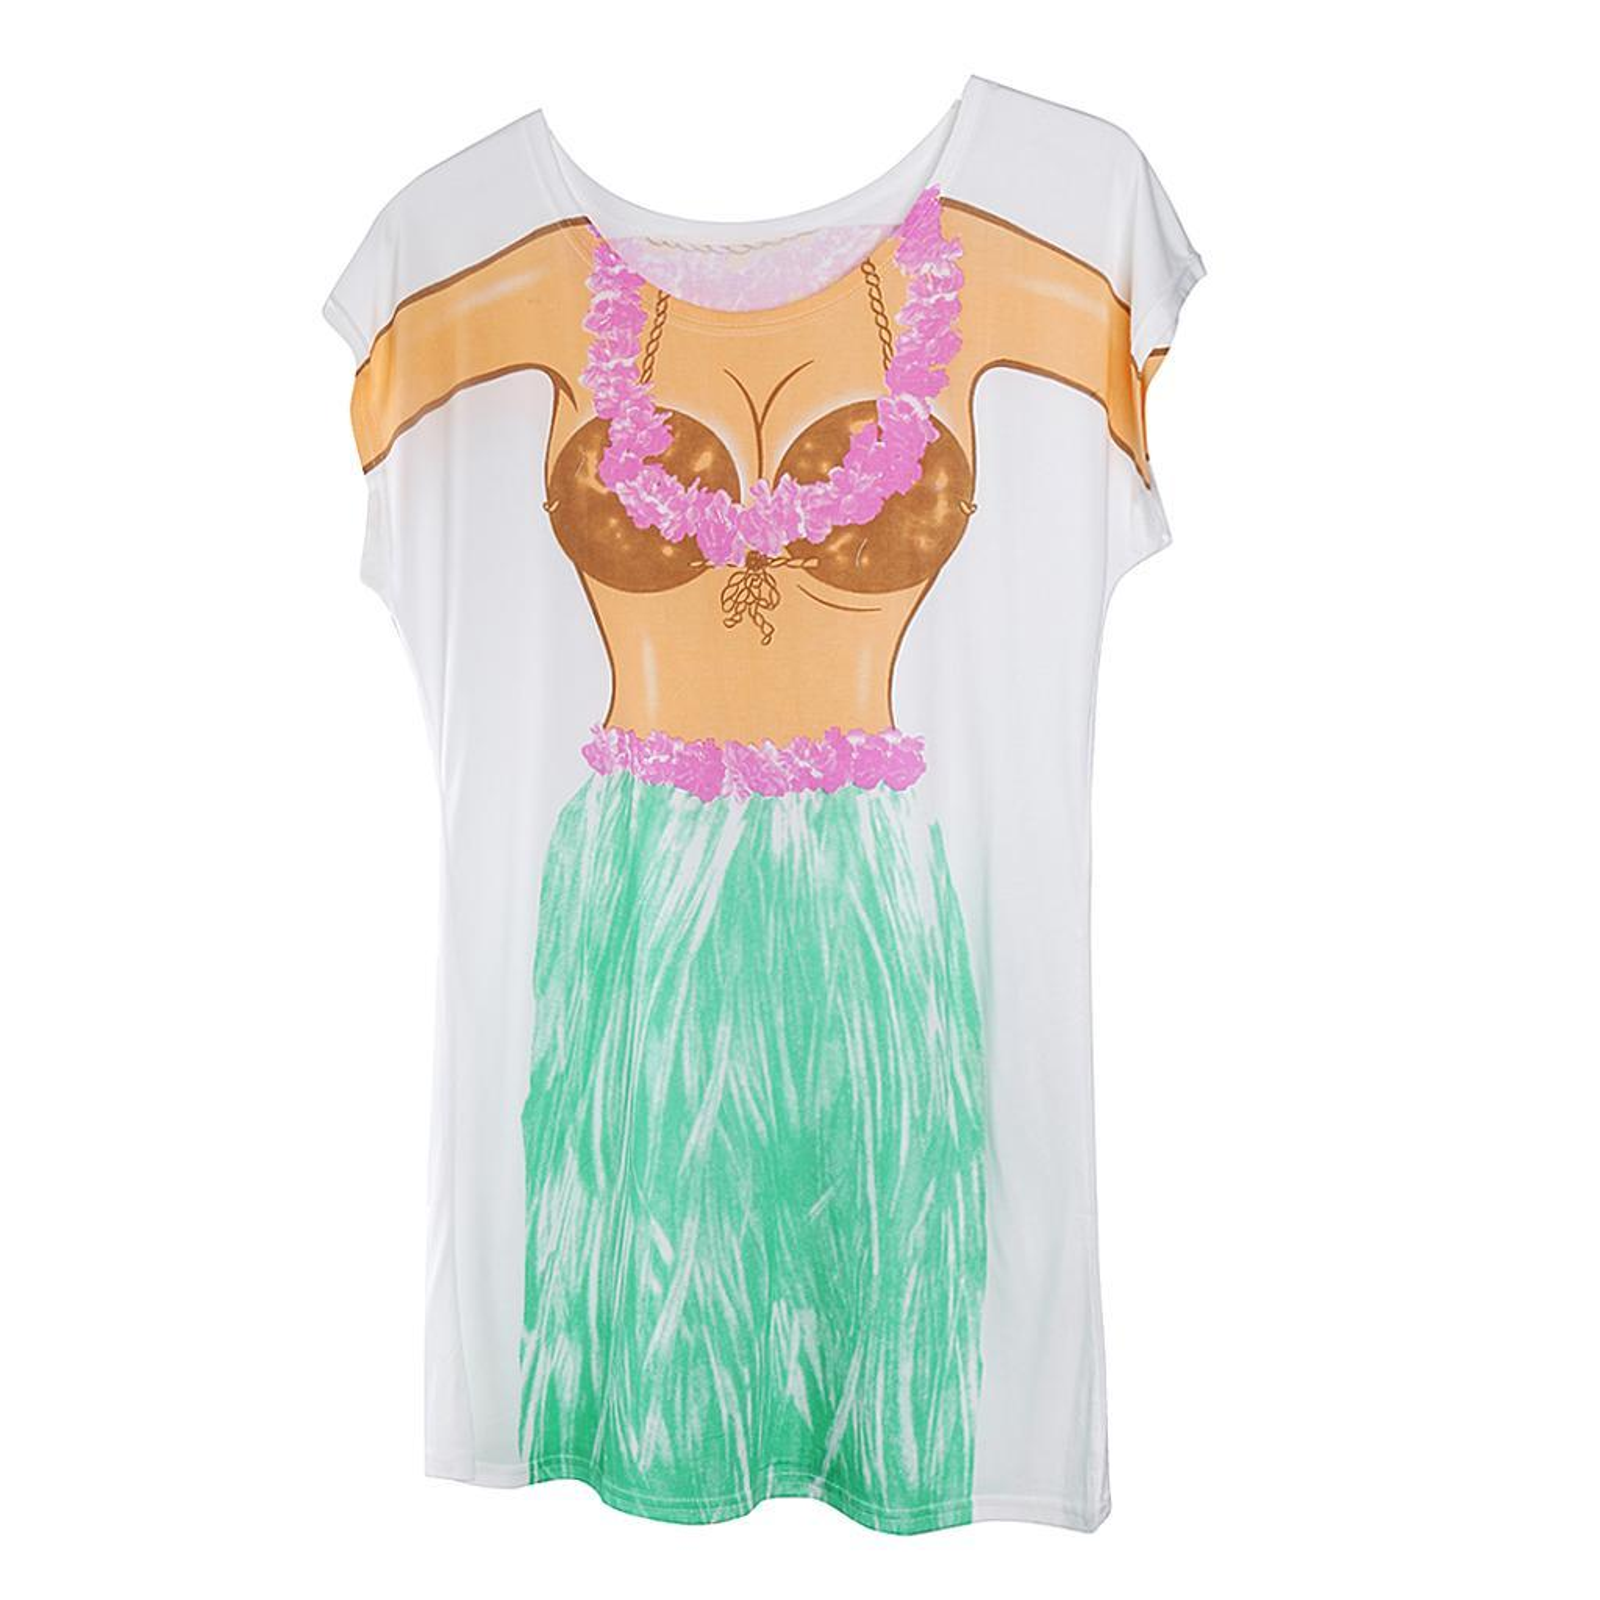 Womens-Bikini-Hawaiian-Summer-Beach-T-Shirt-Cover-Ups-Souvenir-Hen-Night-Pajamas thumbnail 57